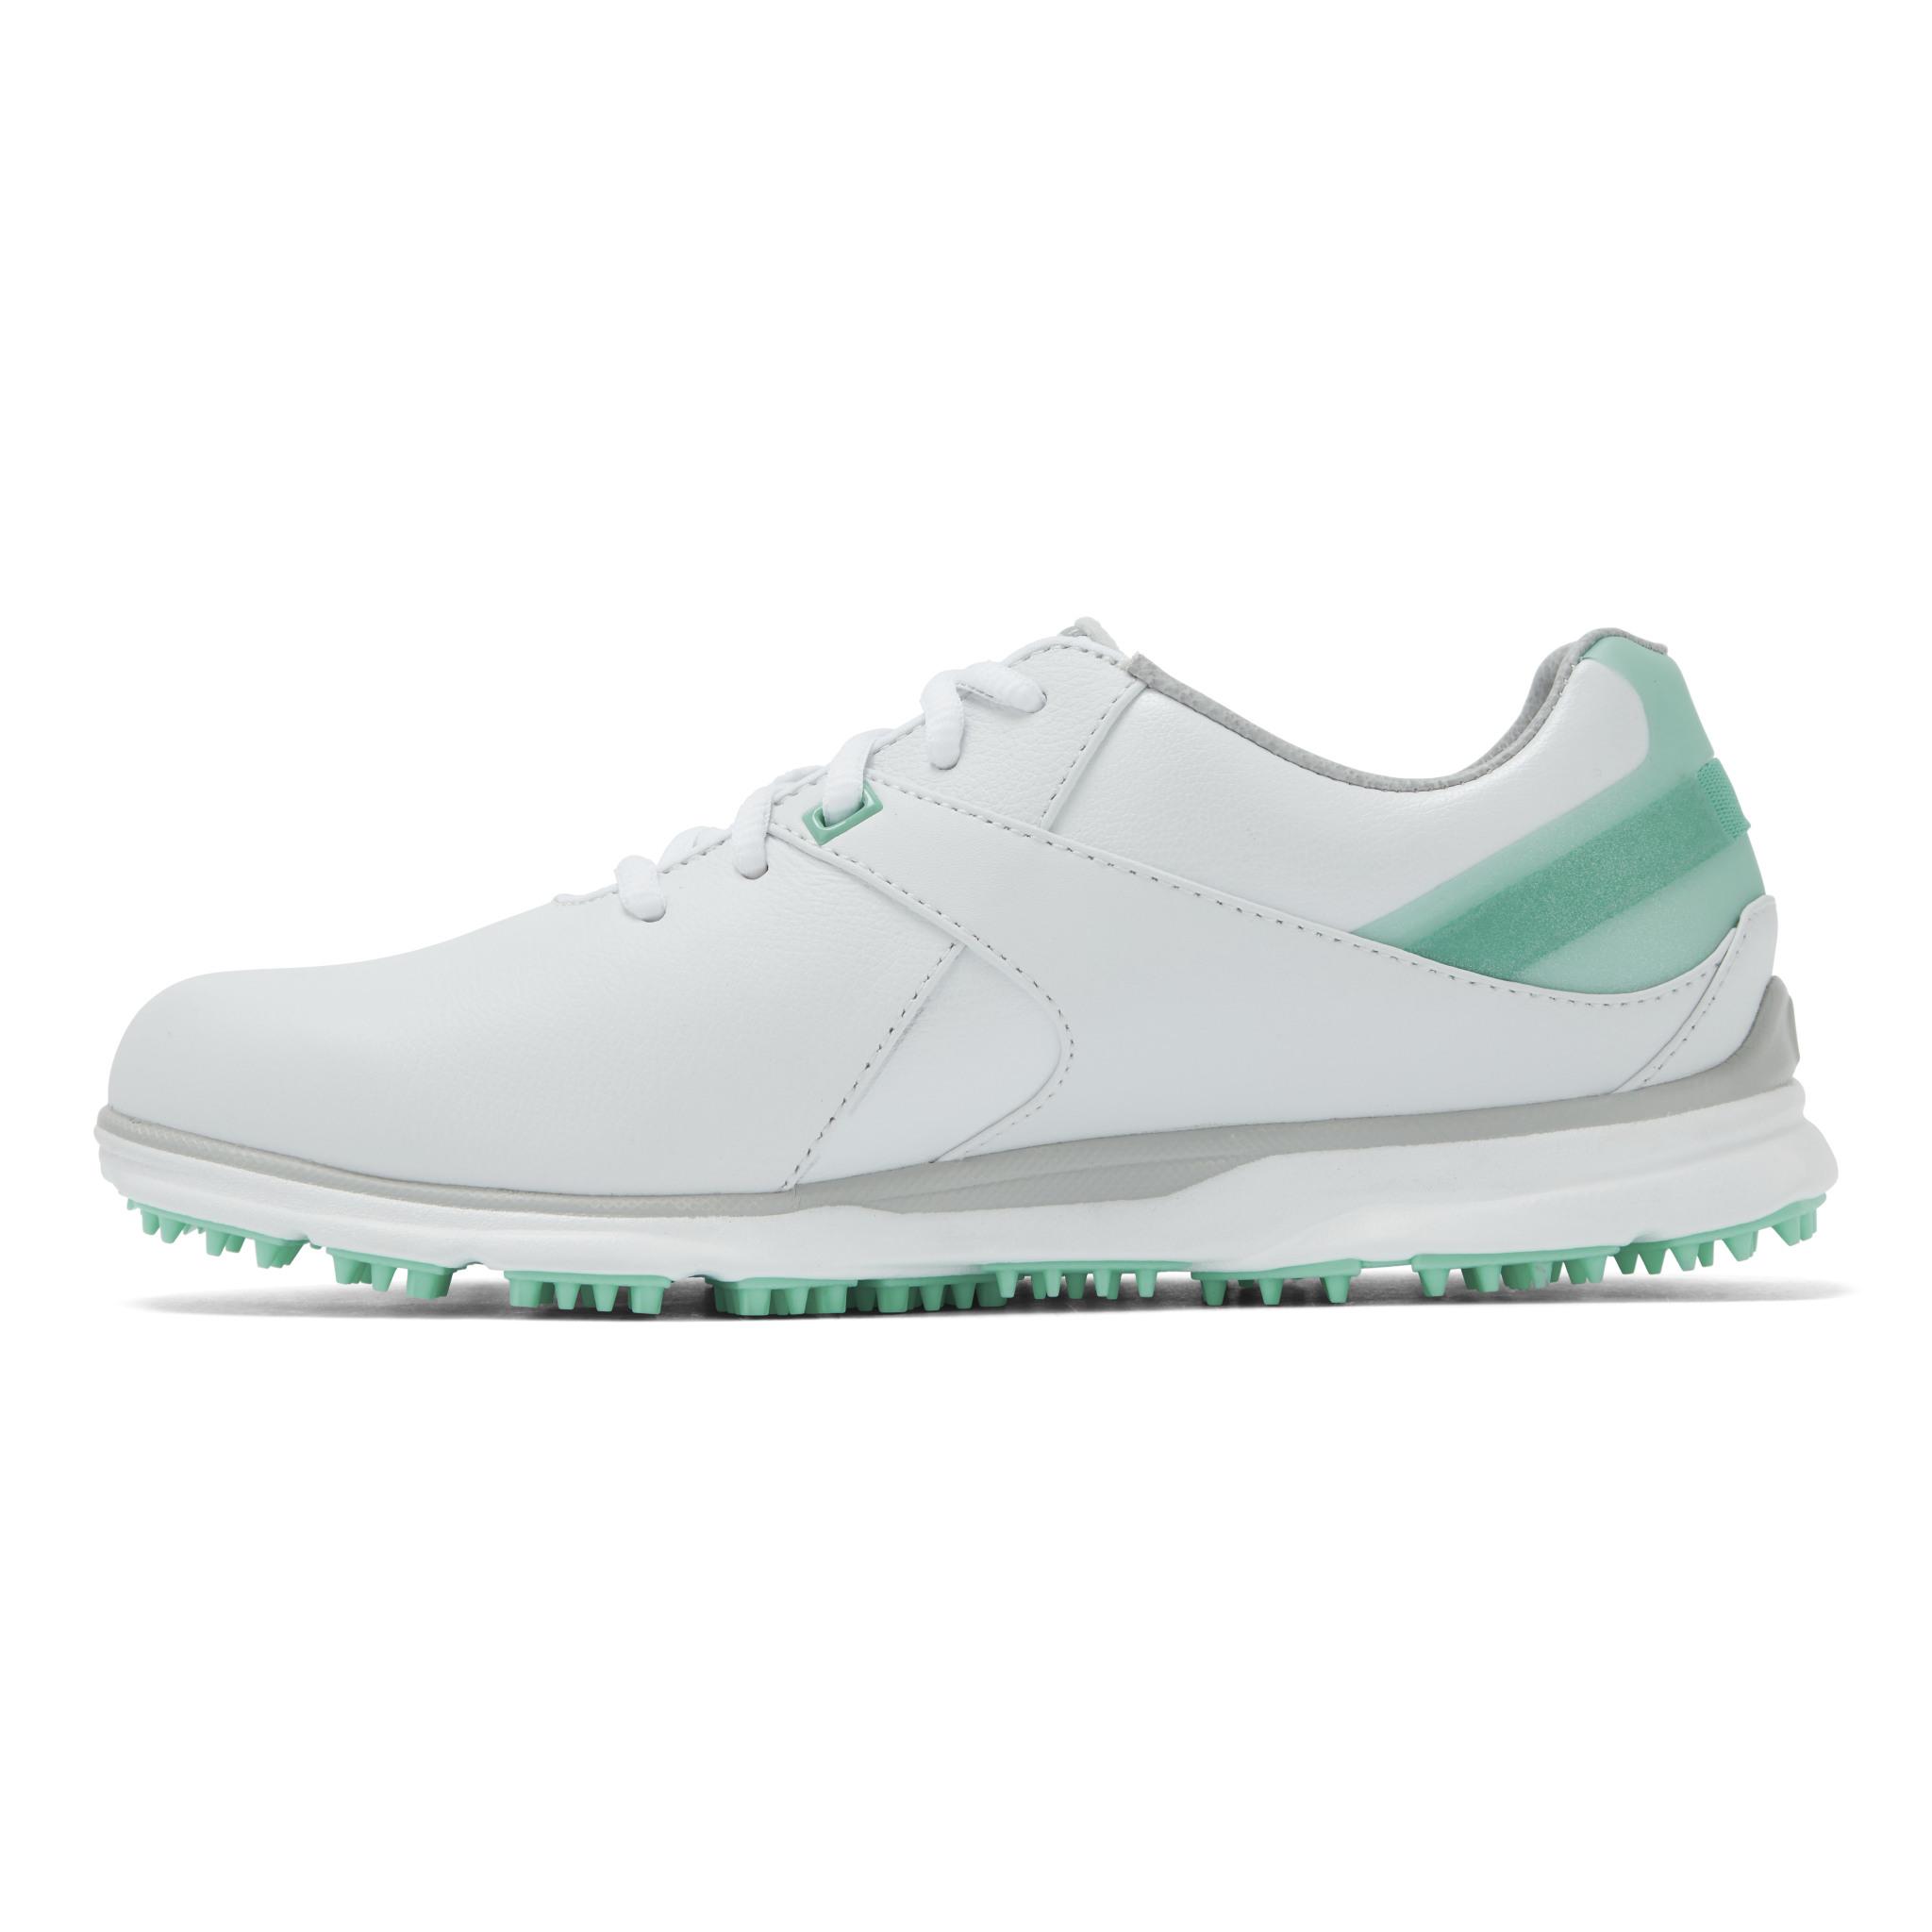 FOOTJOY Pro SL Damen Golfschuhe